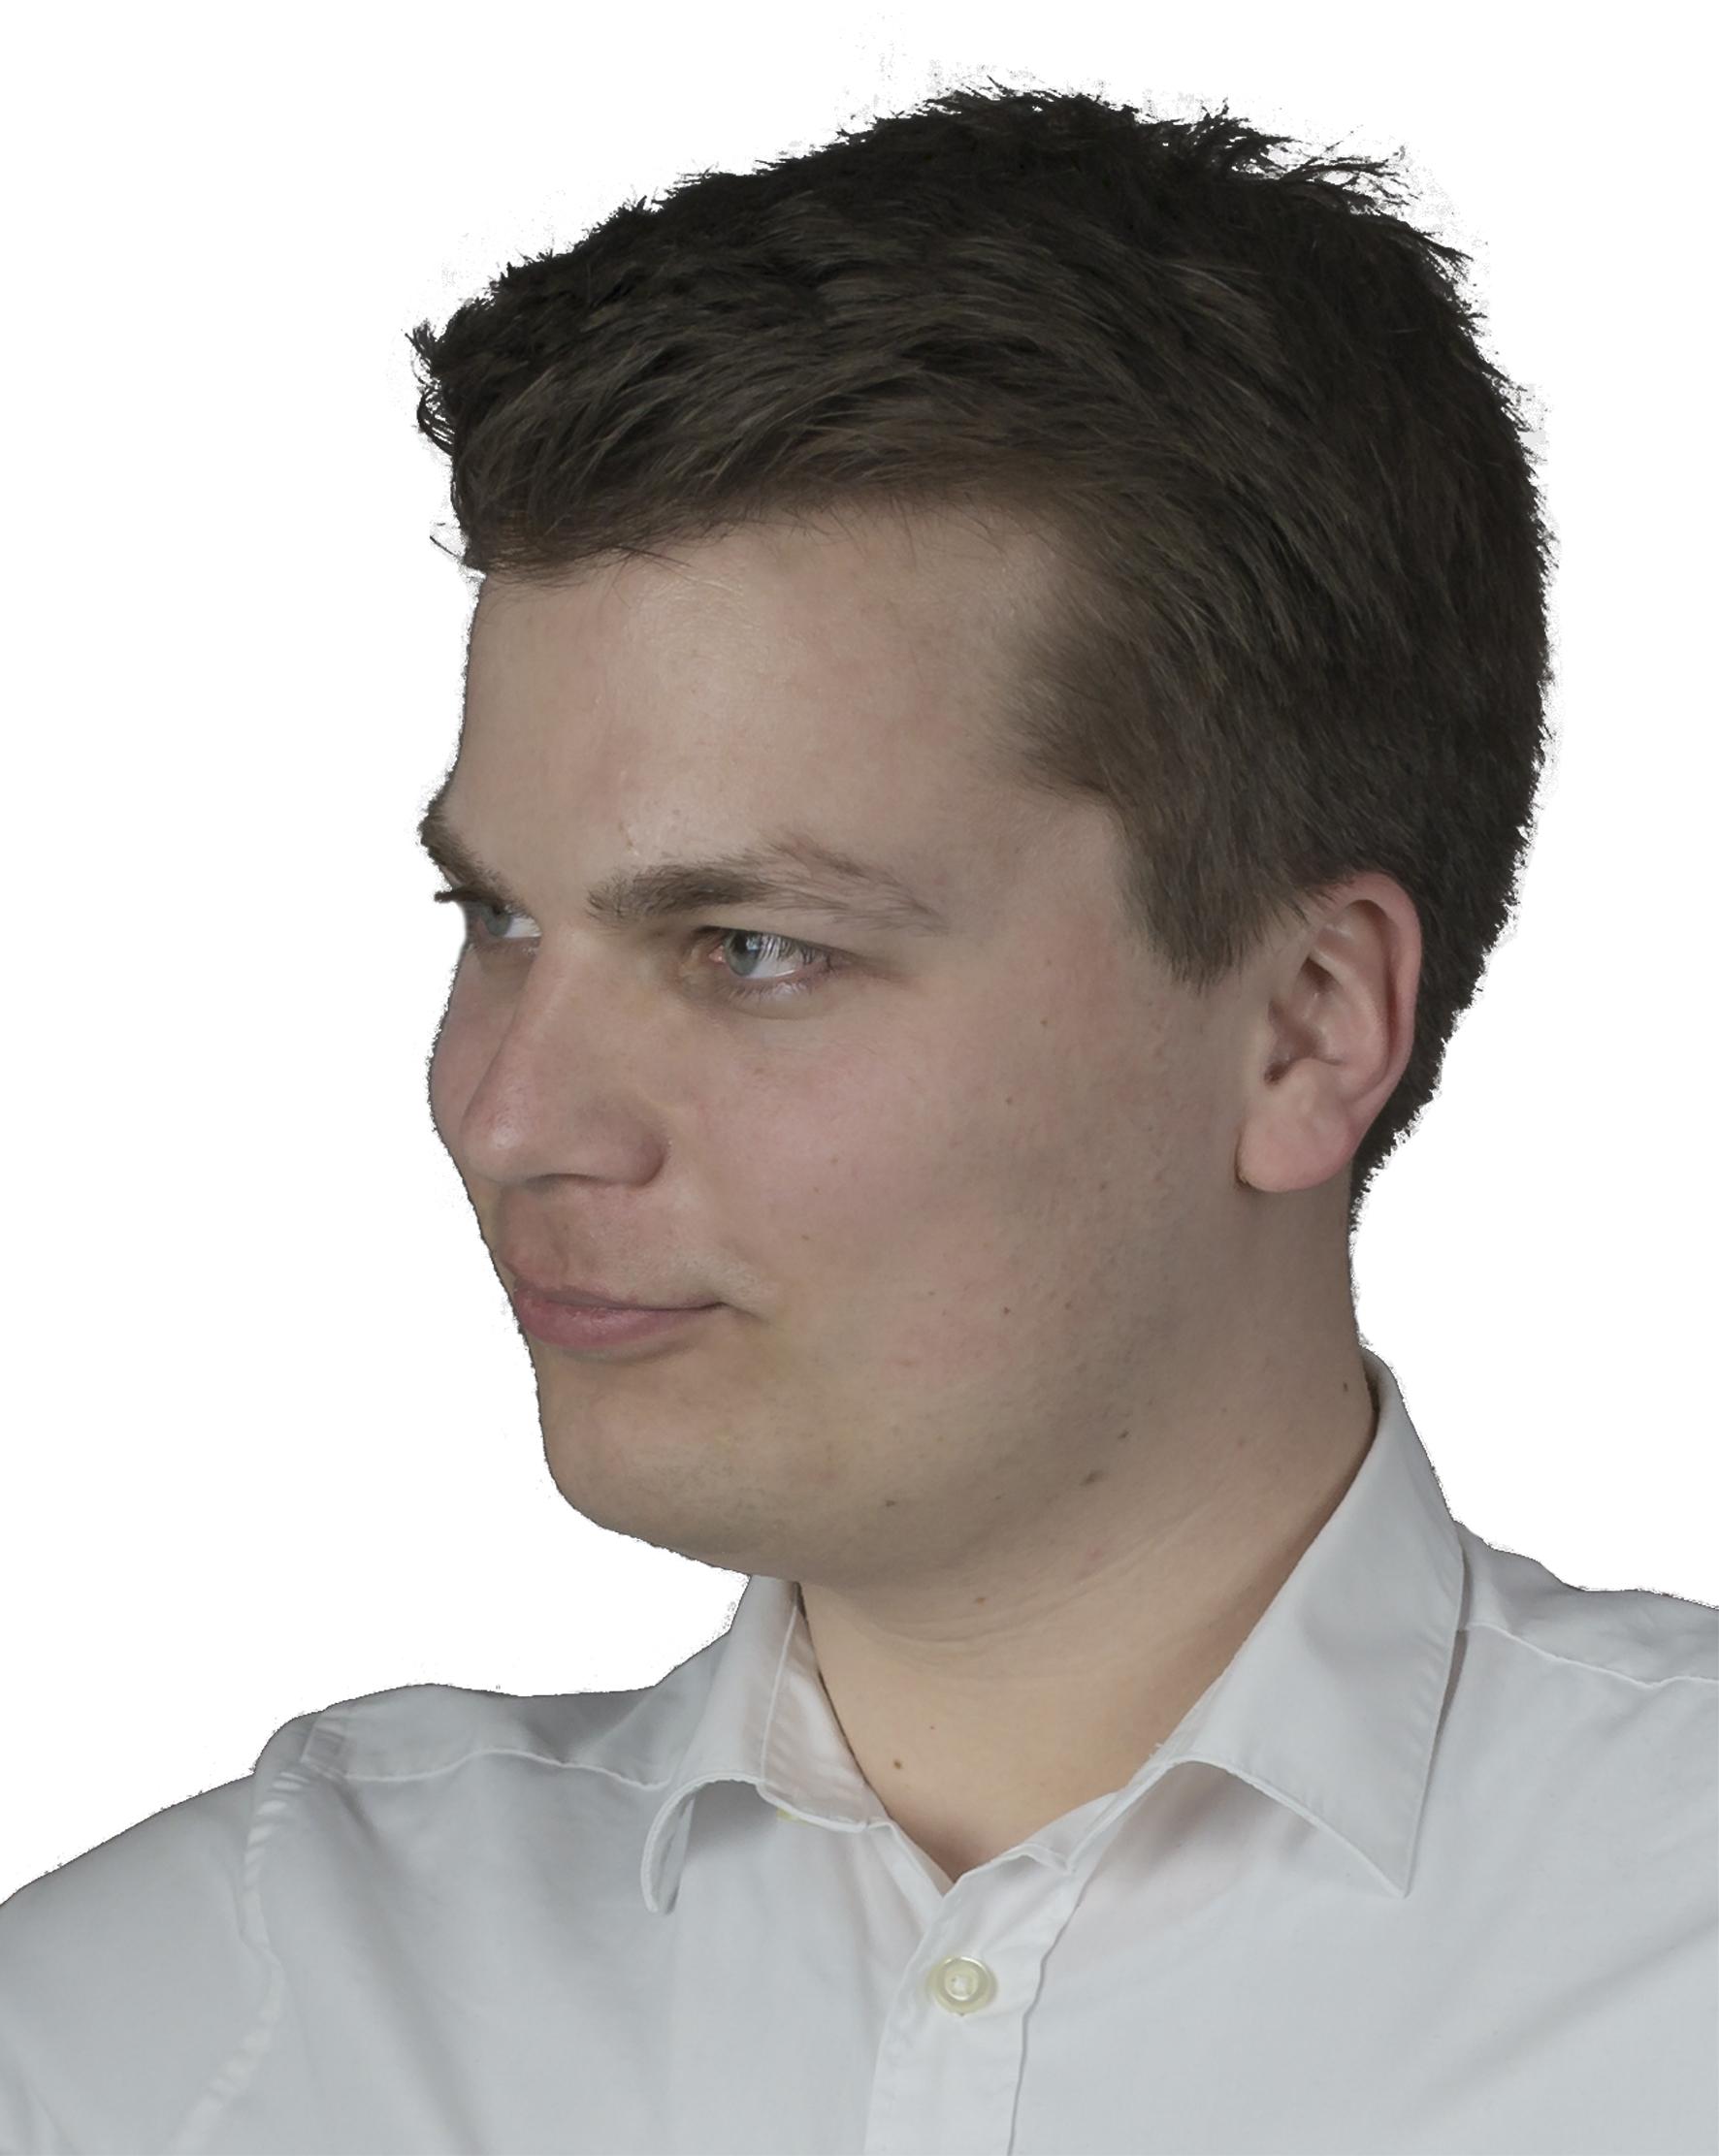 Christian Klemenz, Gründer und Geschäftsführer, St. Erhard GmbH, Bamberg